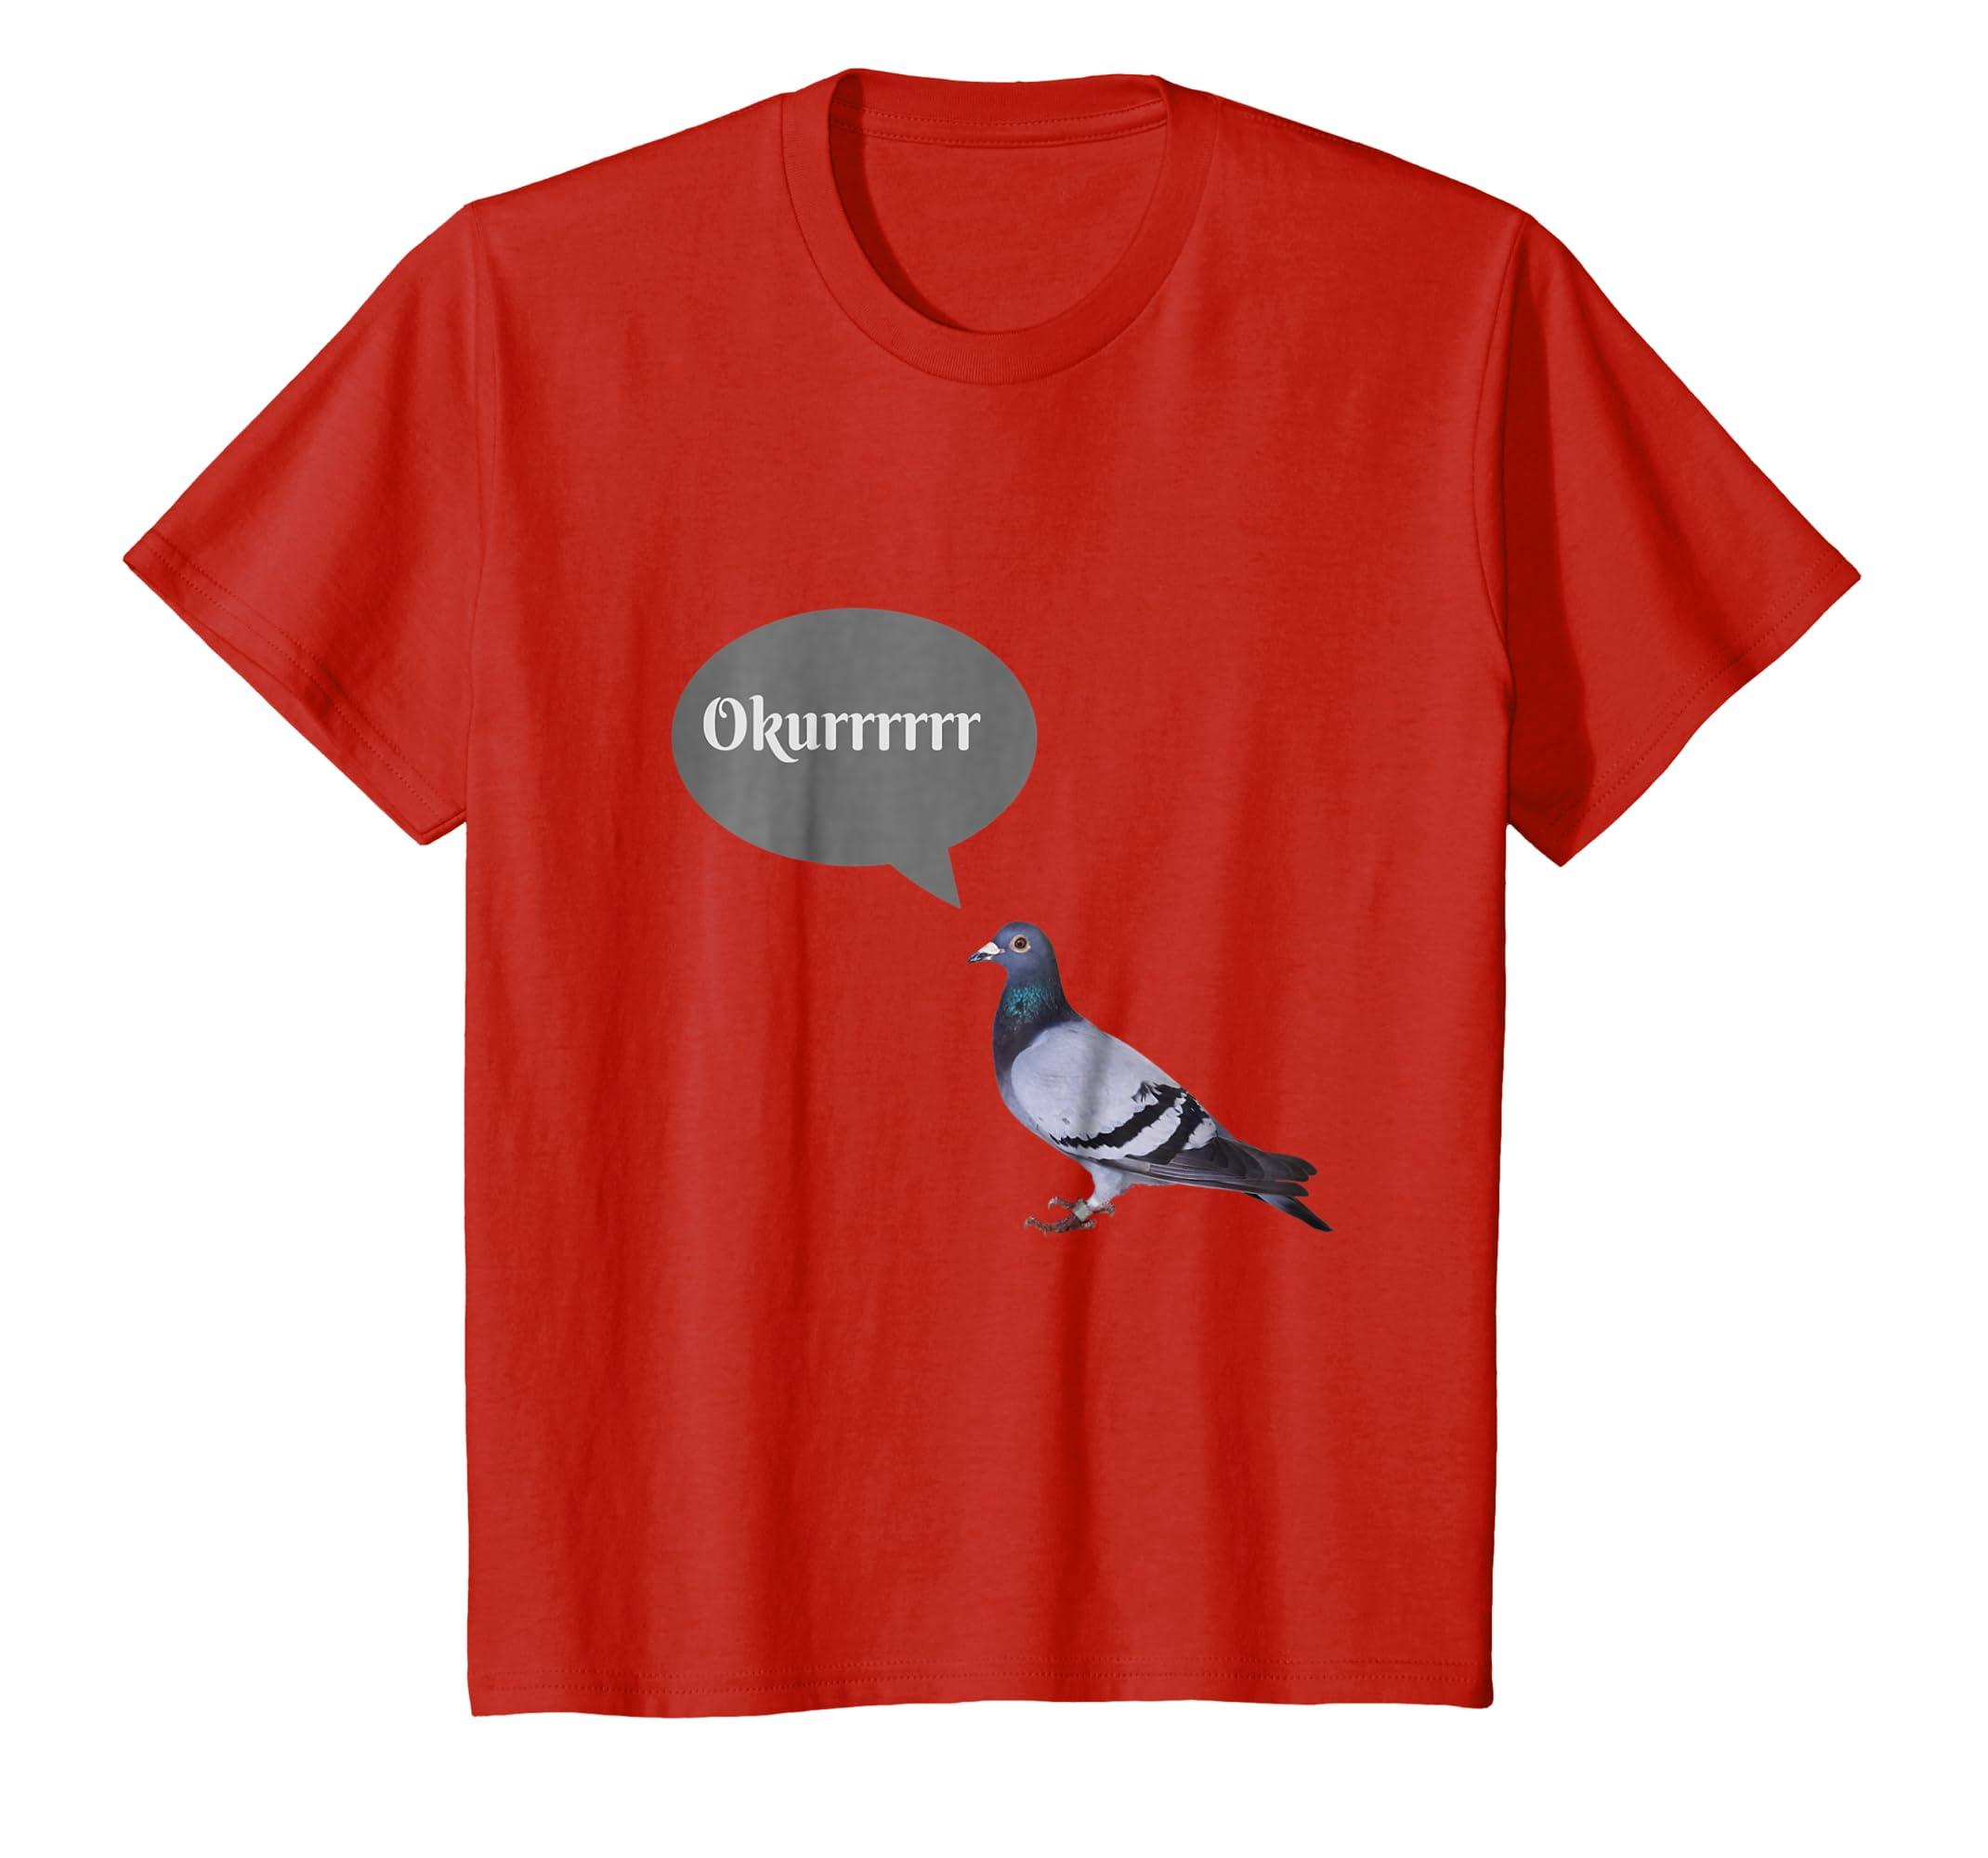 Okurrr Pigeon T shirt-Protee